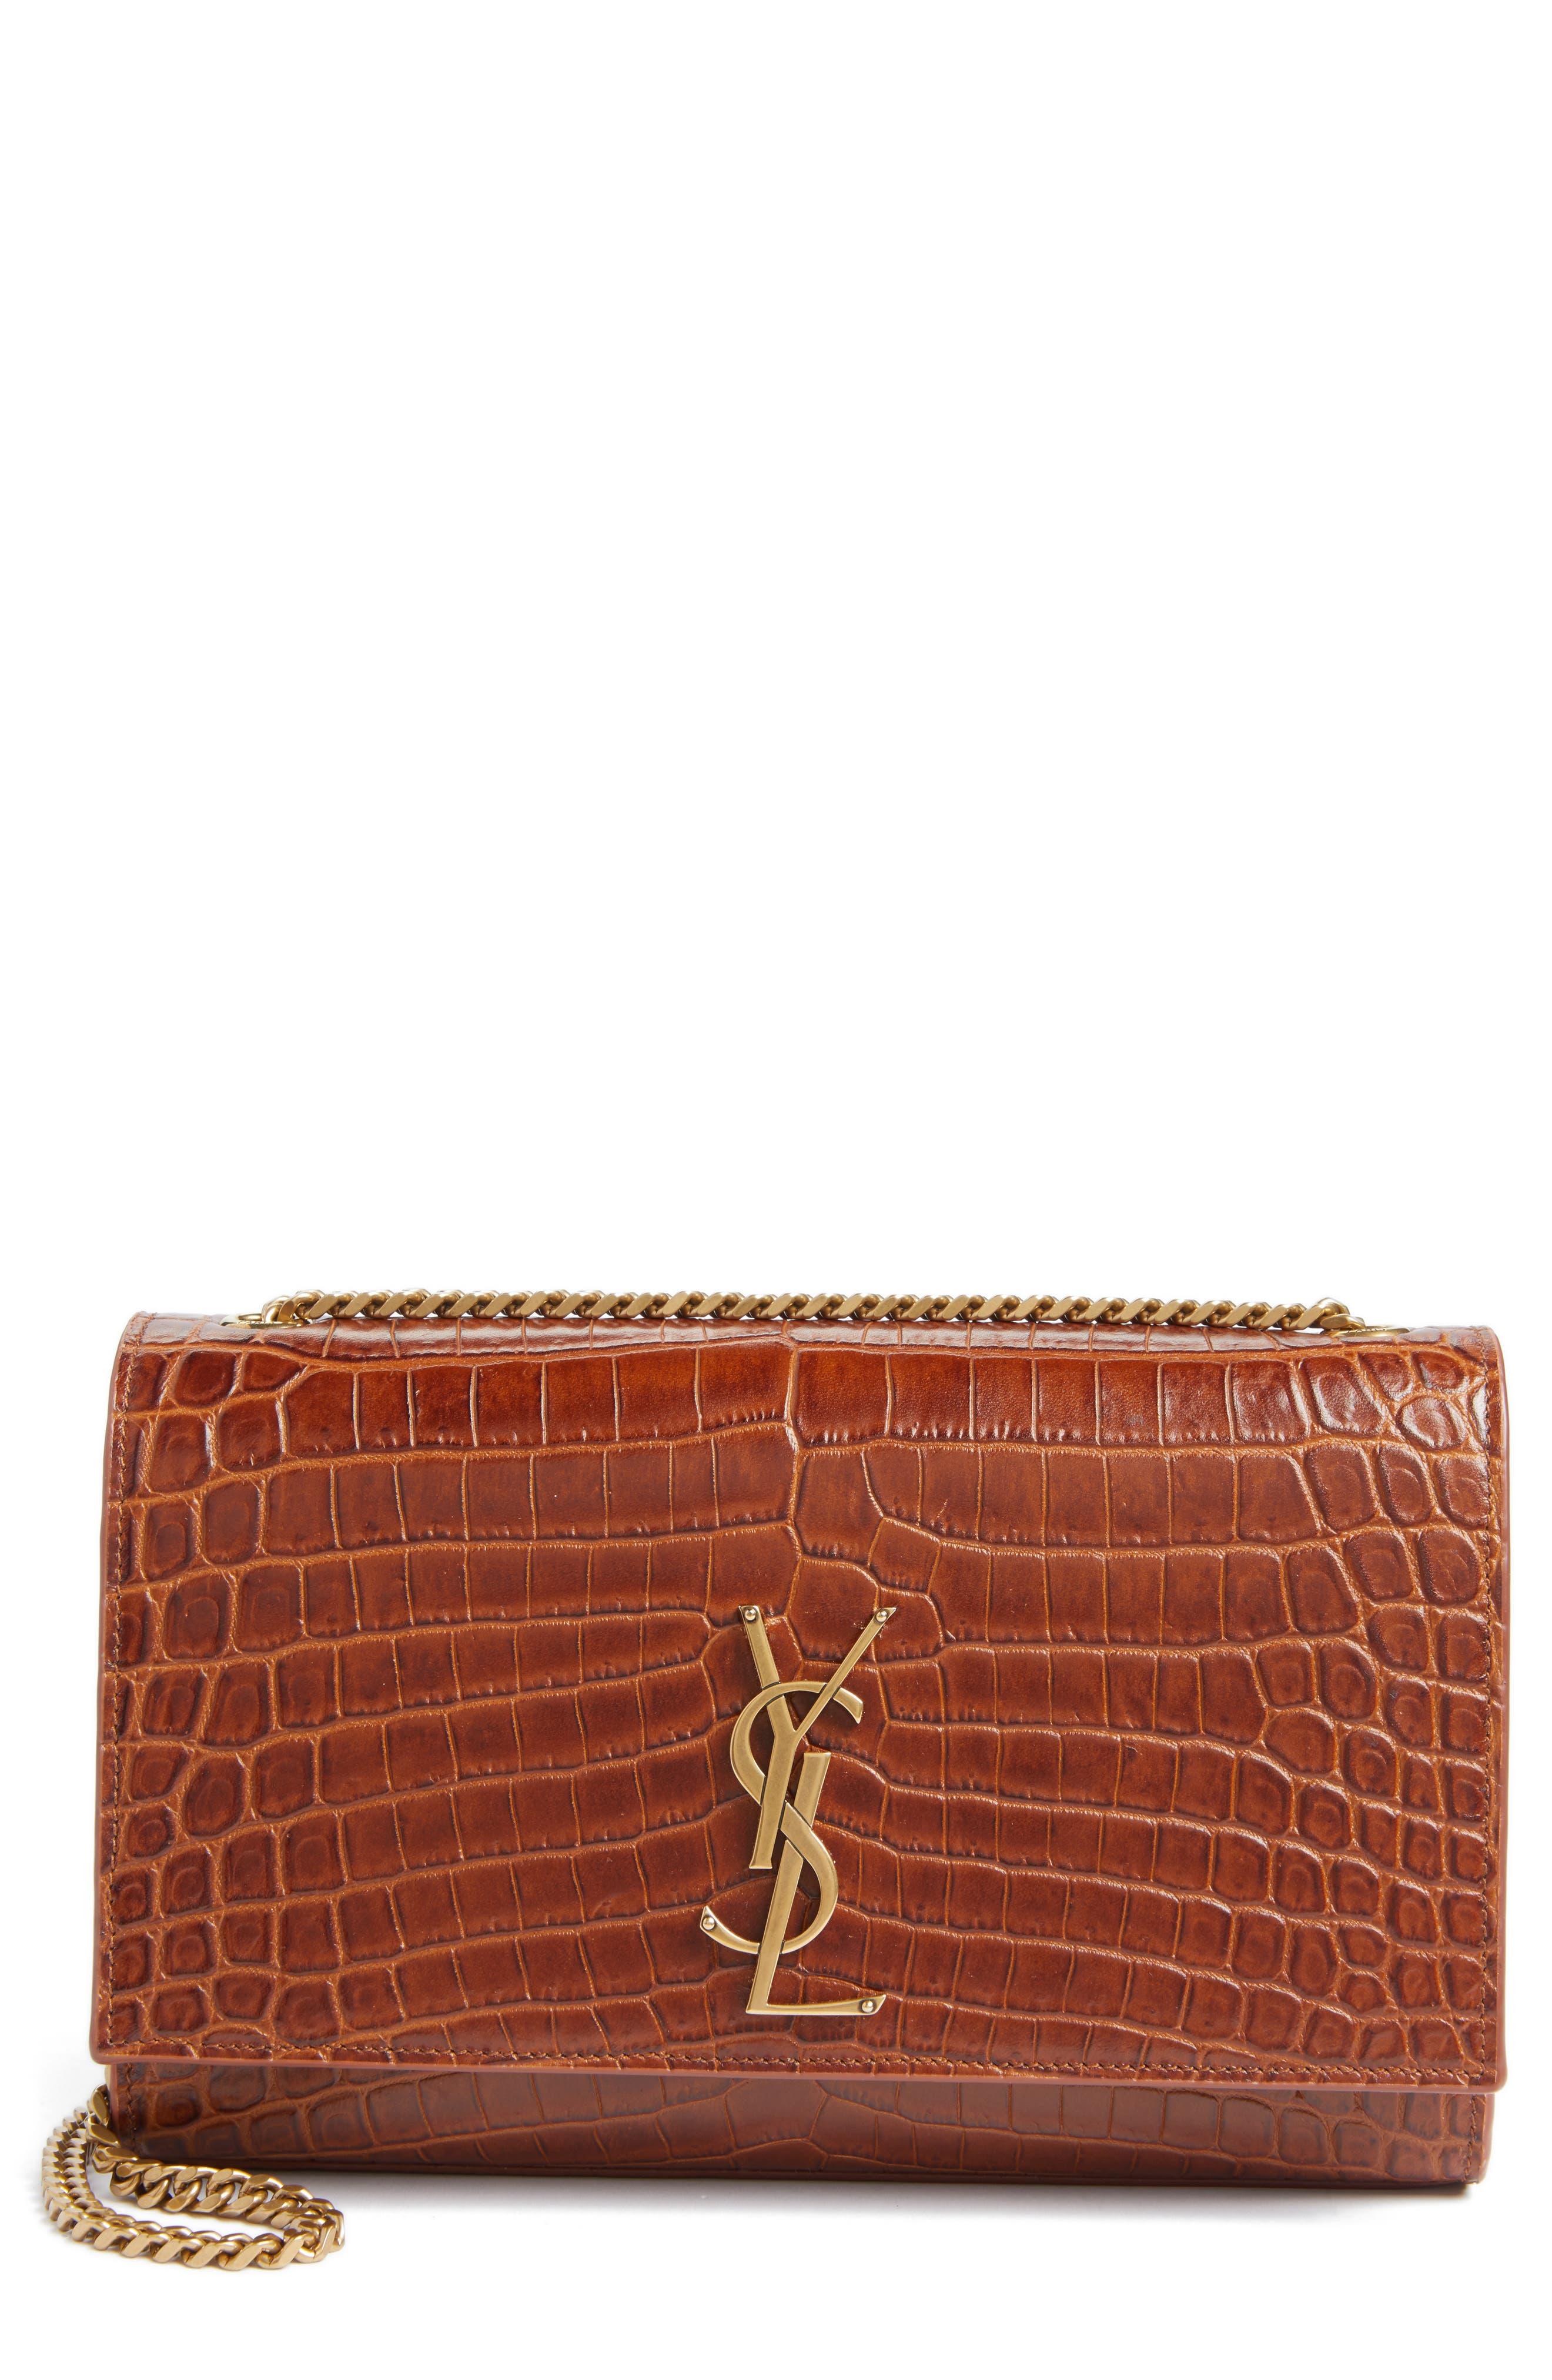 Main Image - Saint Laurent Medium Kate Croc Embossed Leather Shoulder Bag